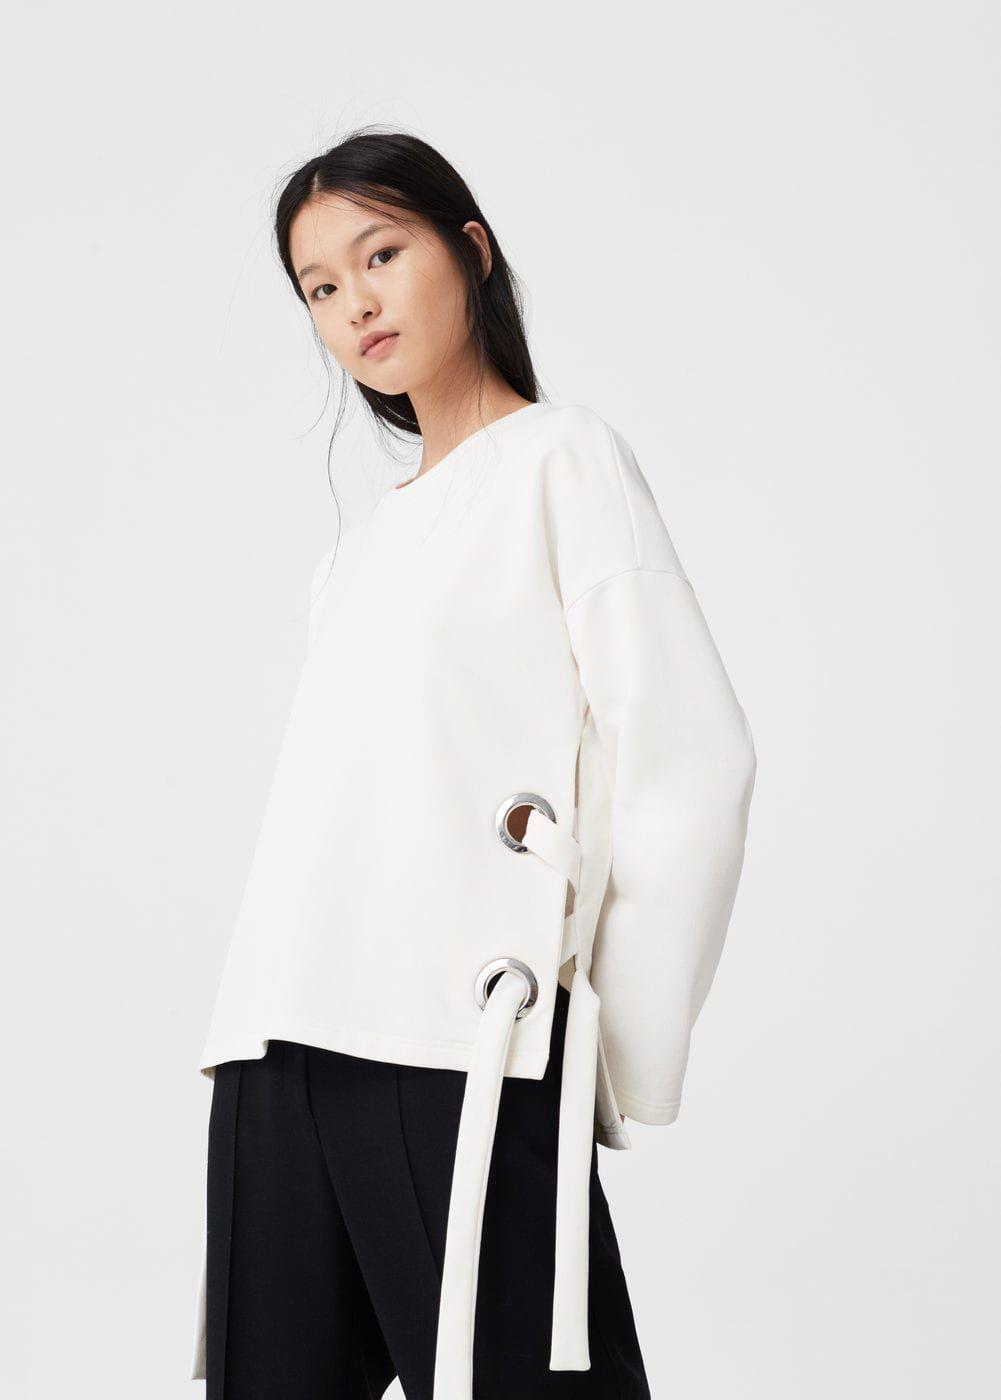 Fiyonklu dokuma sweatshirt kadın sweatshirt woman and sweat shirt